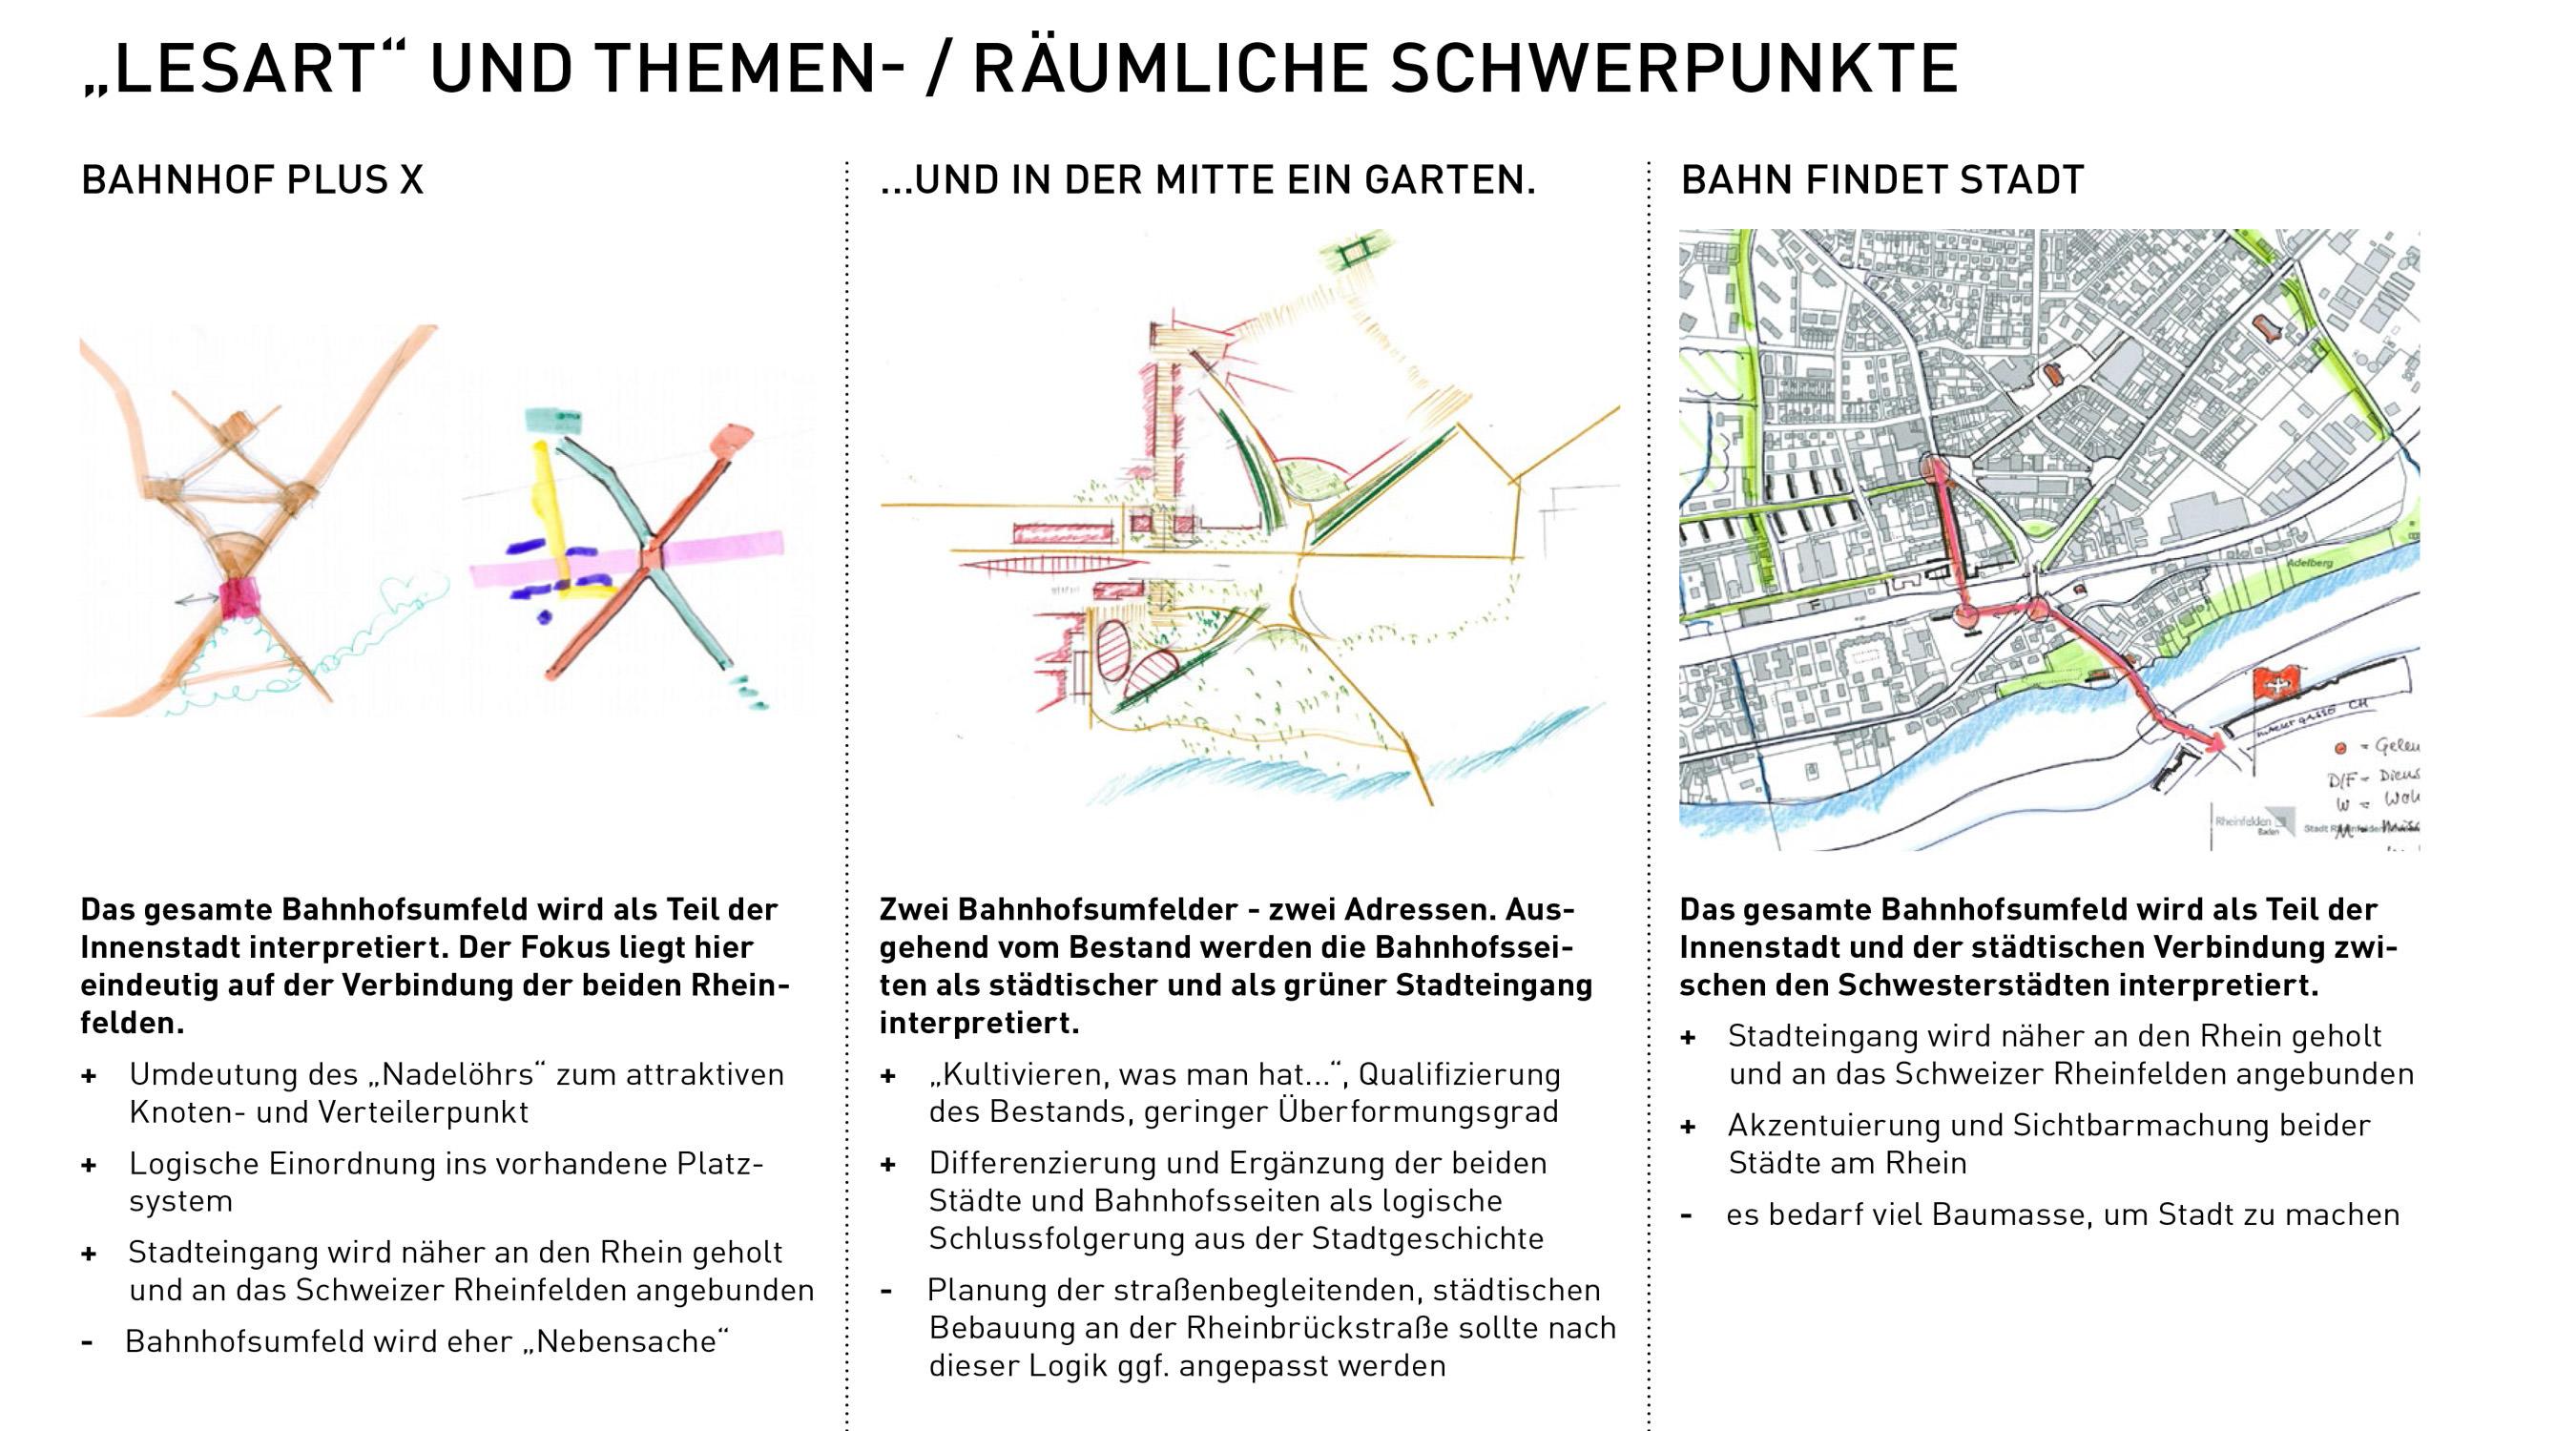 Rheinfelden Bauforum Auswertung